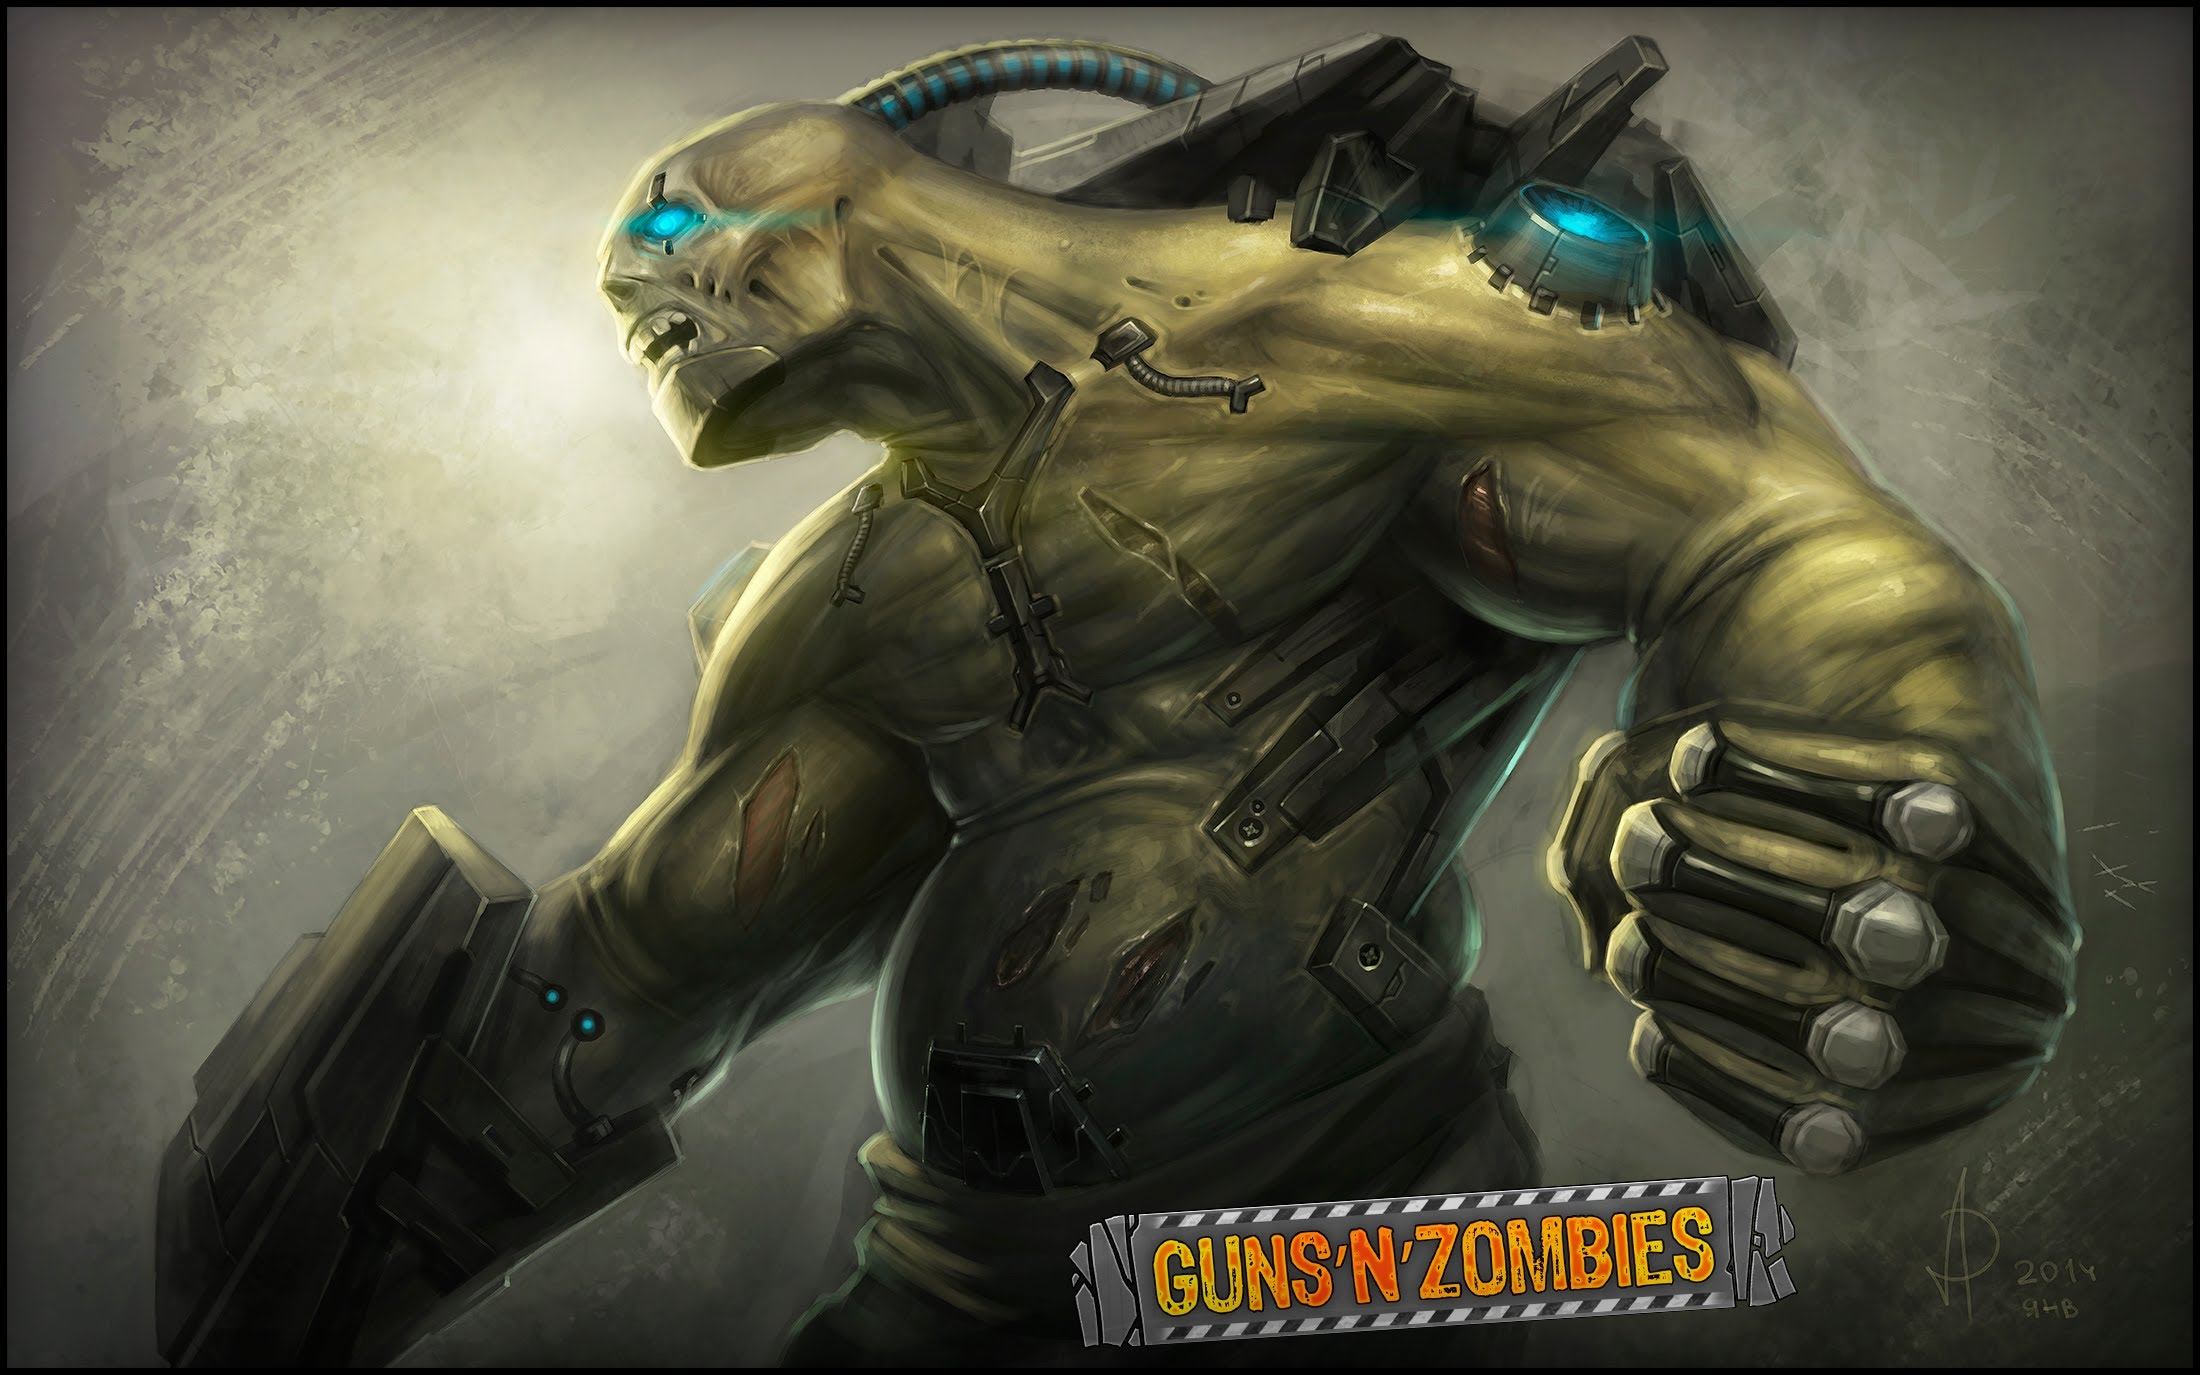 Guns'N'Zombies Backgrounds, Compatible - PC, Mobile, Gadgets  2200x1375 px